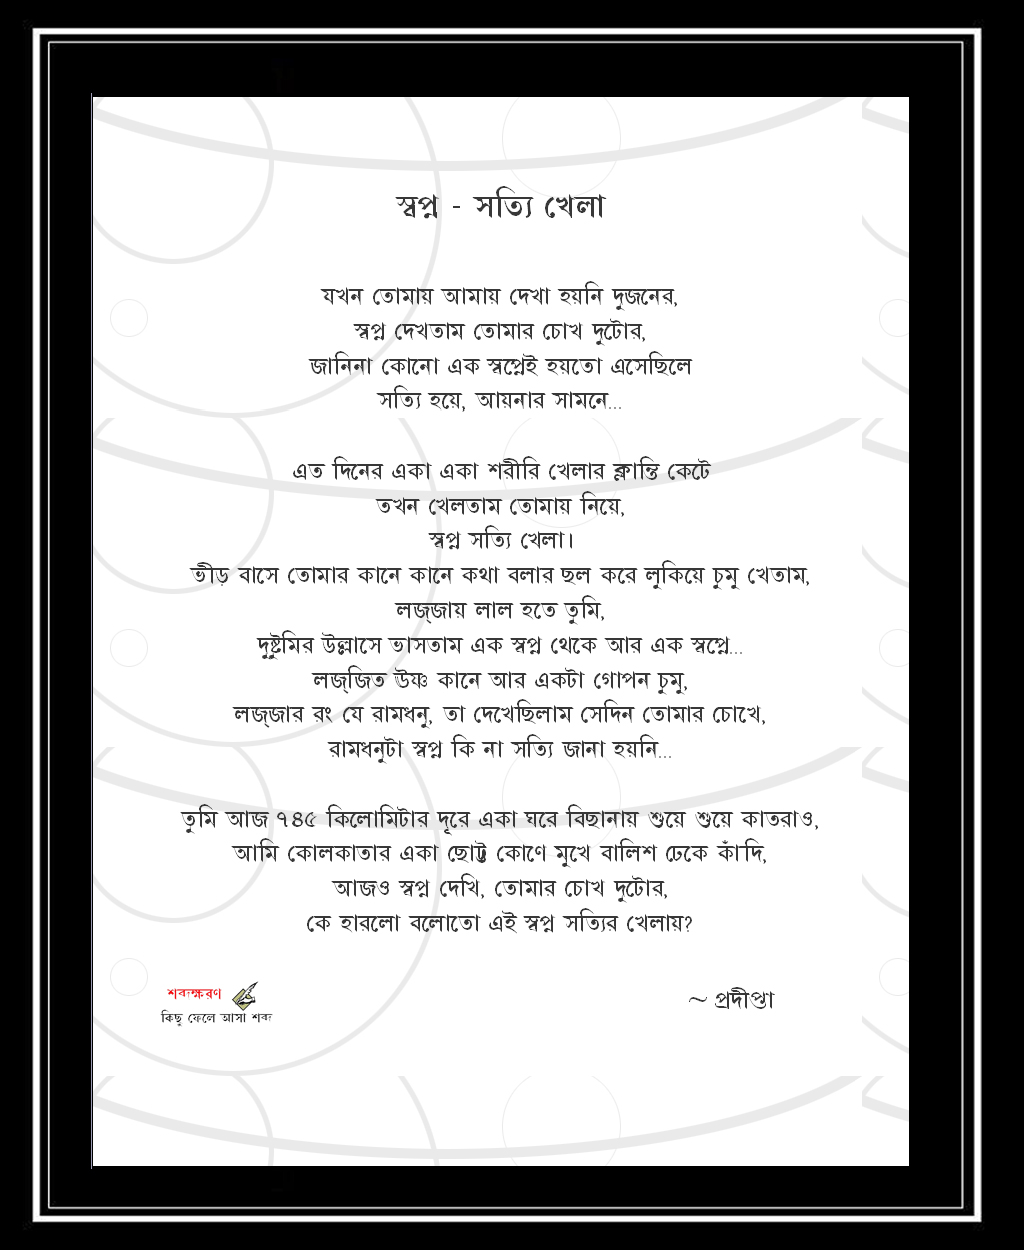 Bangla Choti bangla choda chudir golpo bangla font